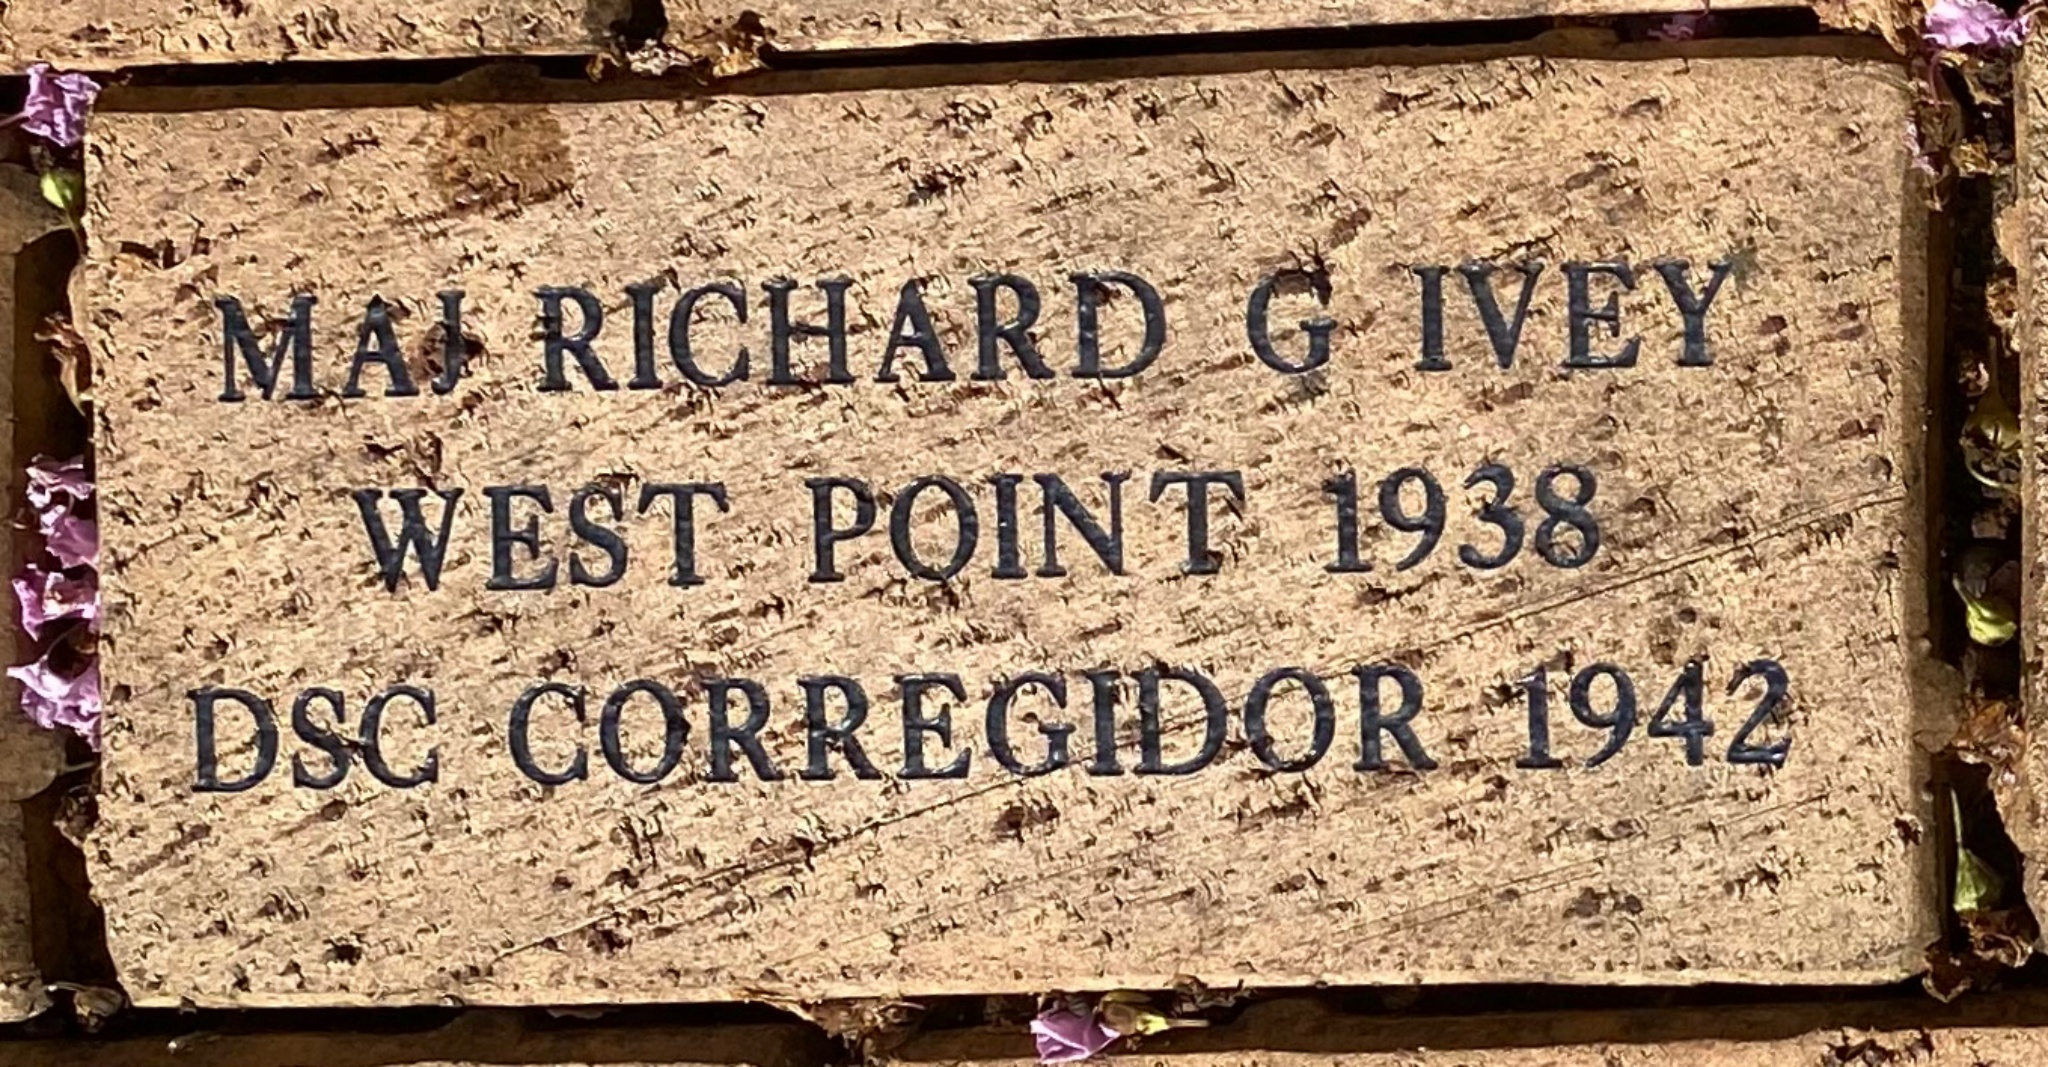 MAJ RICHARD G IVEY WEST POINT 1938 DSC CORREGIDOR 1942